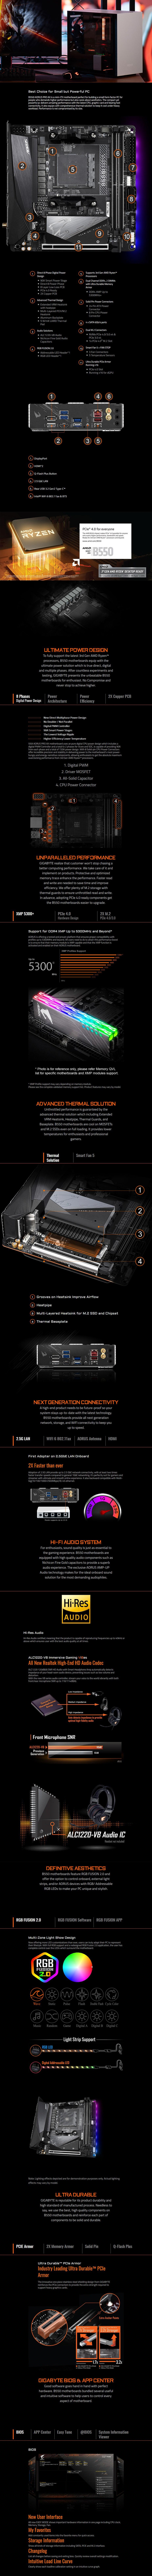 Bundle Deal: AMD Ryzen 5 5600X + Gigabyte B550I AORUS PRO AX ATX Motherboard - Desktop Overview 2